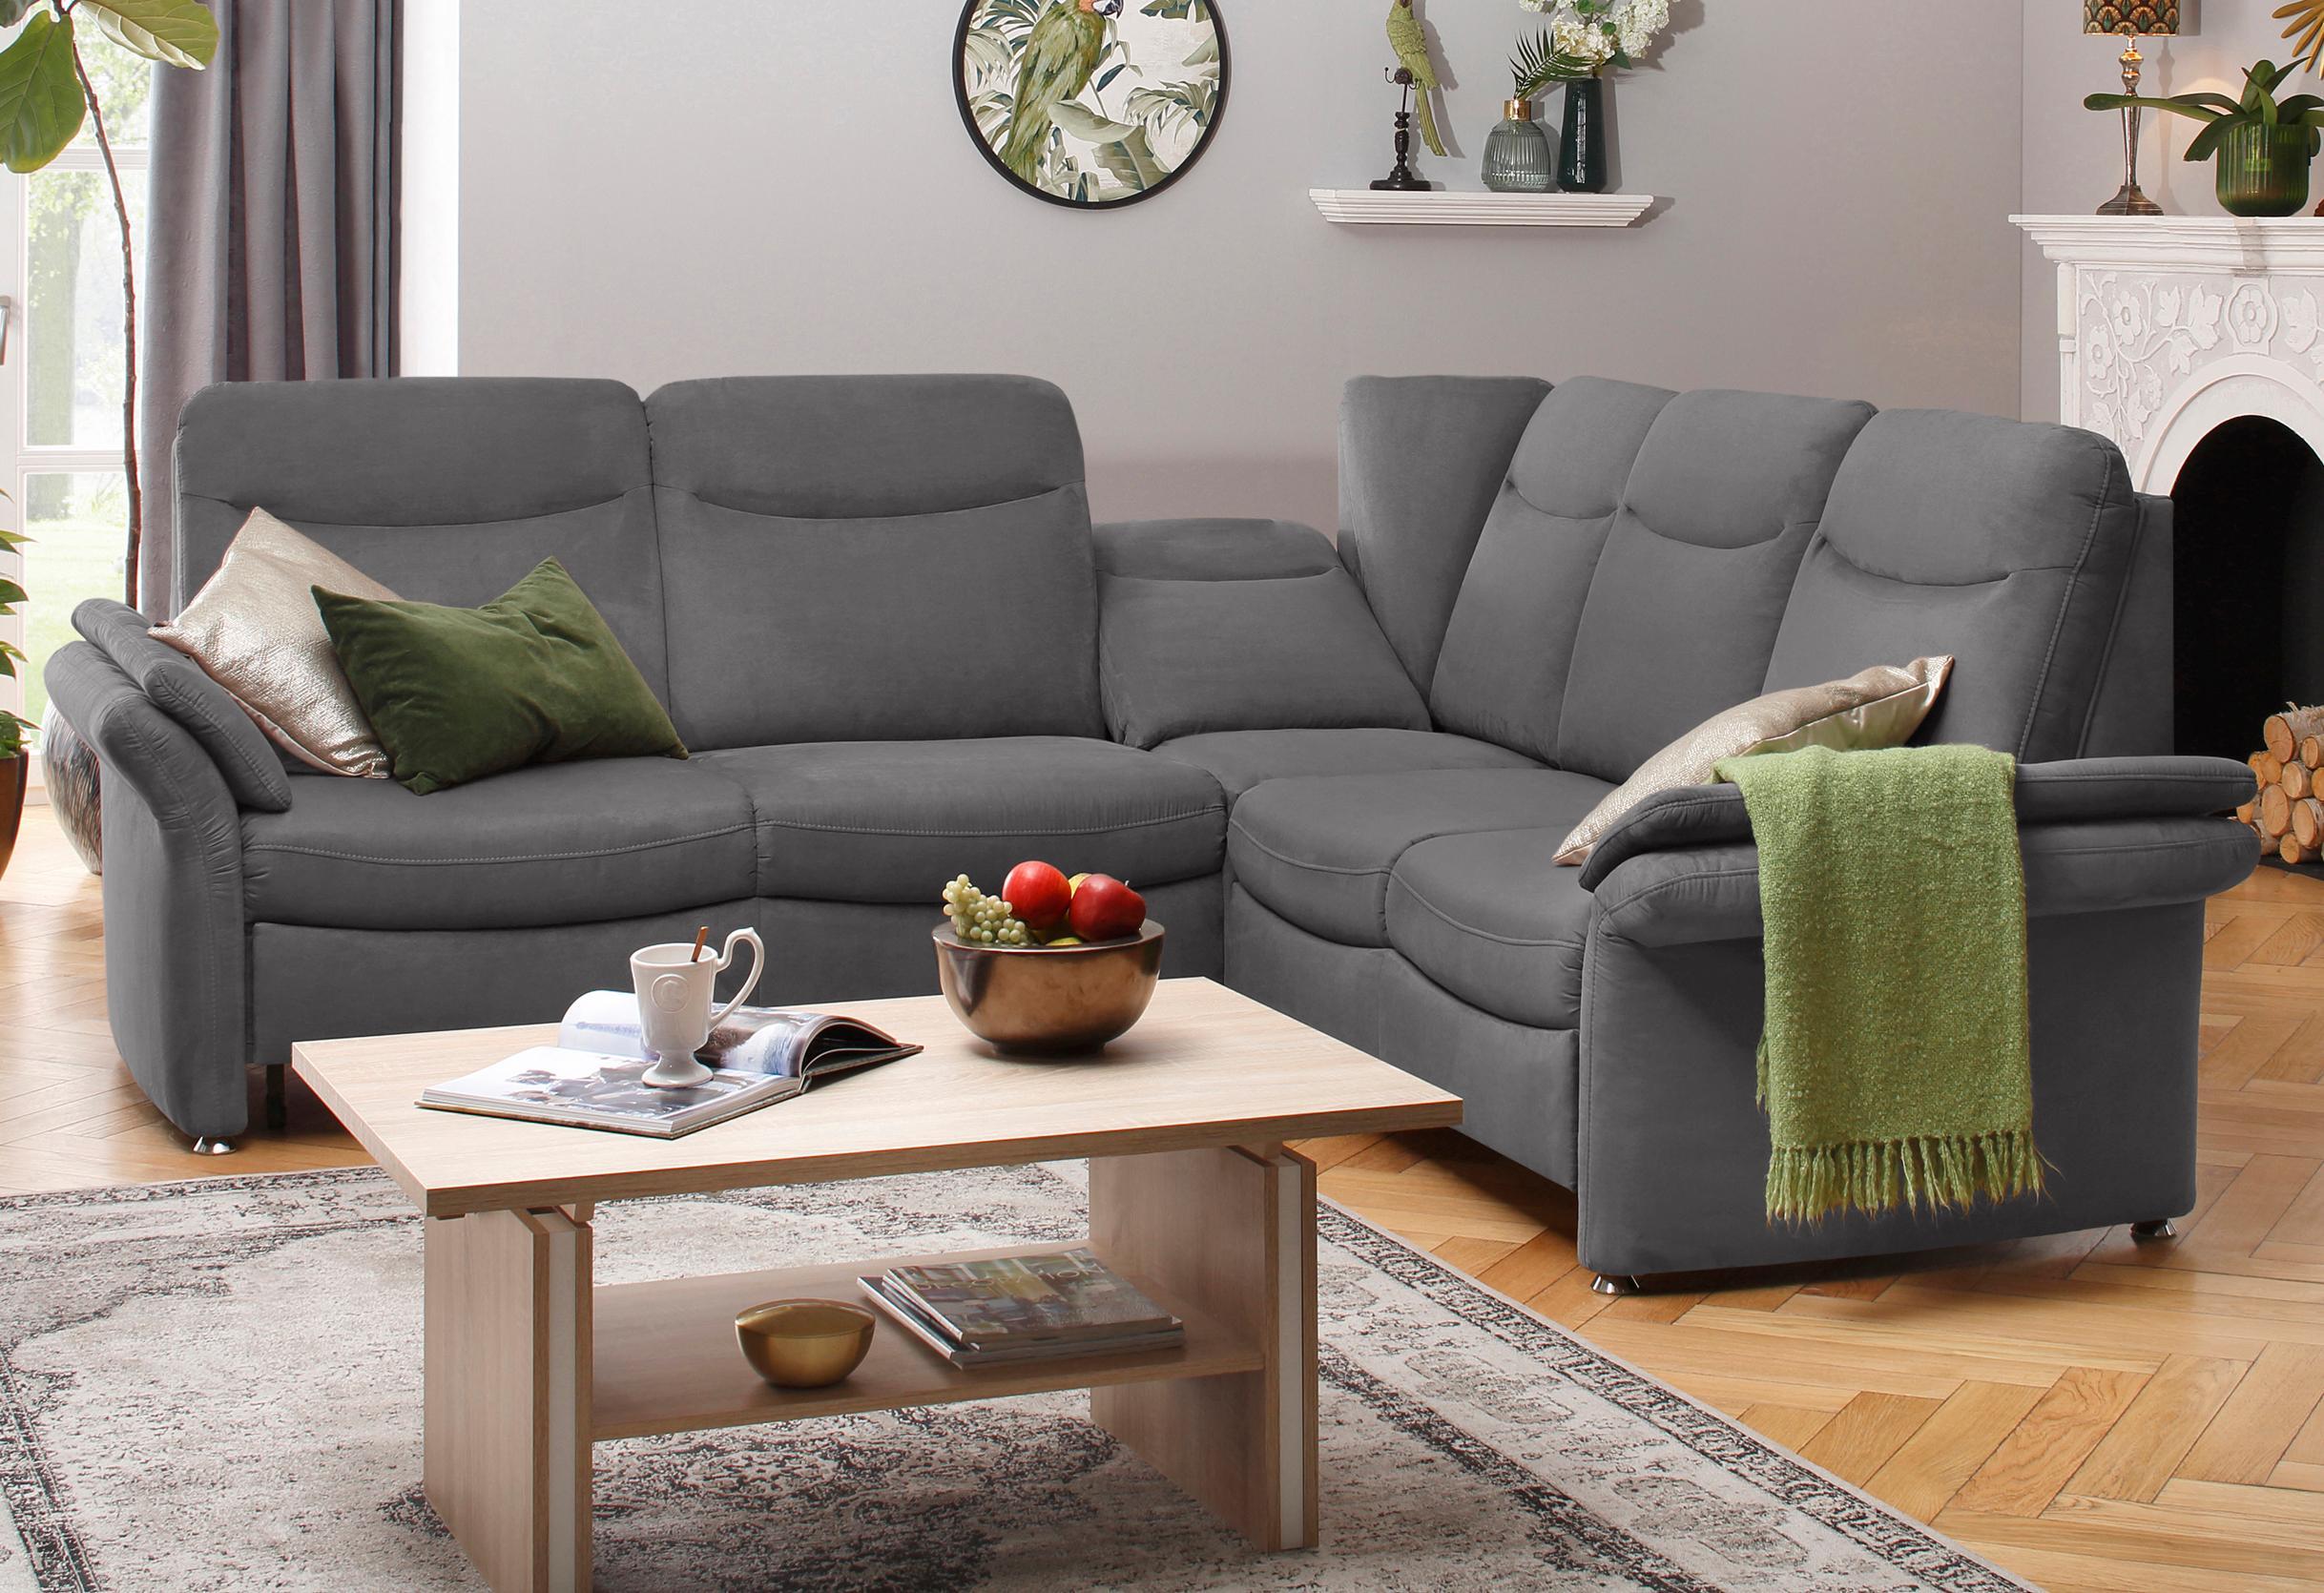 delavita ecksofa tahoma mit armlehnfunktion wahlweise. Black Bedroom Furniture Sets. Home Design Ideas